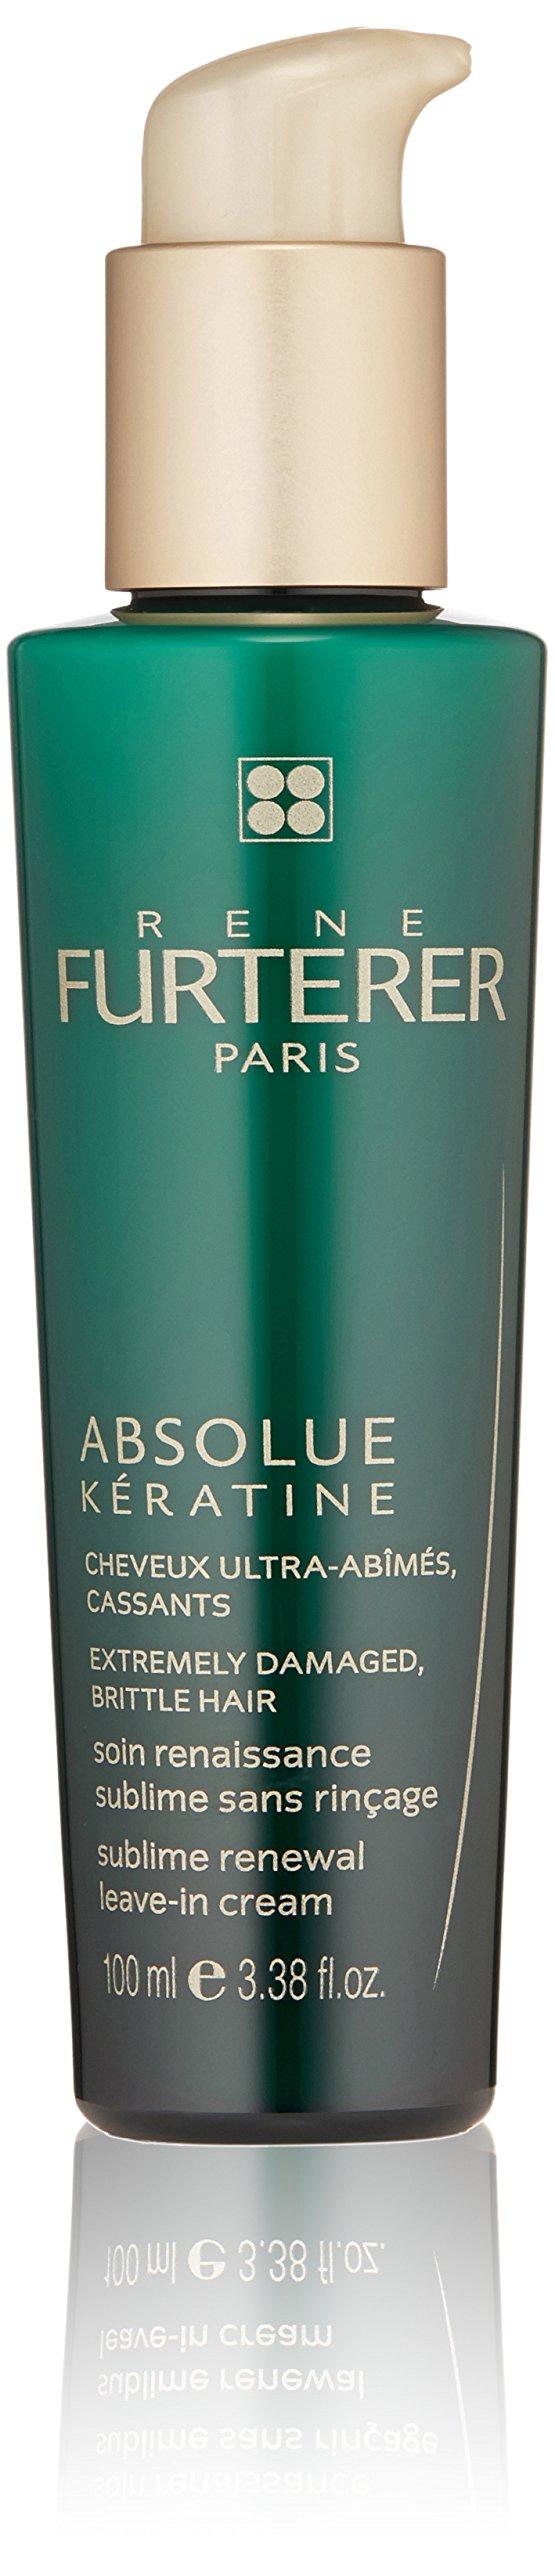 Rene Furterer Absolue Keratine Sublime Renewal Leave-In Cream